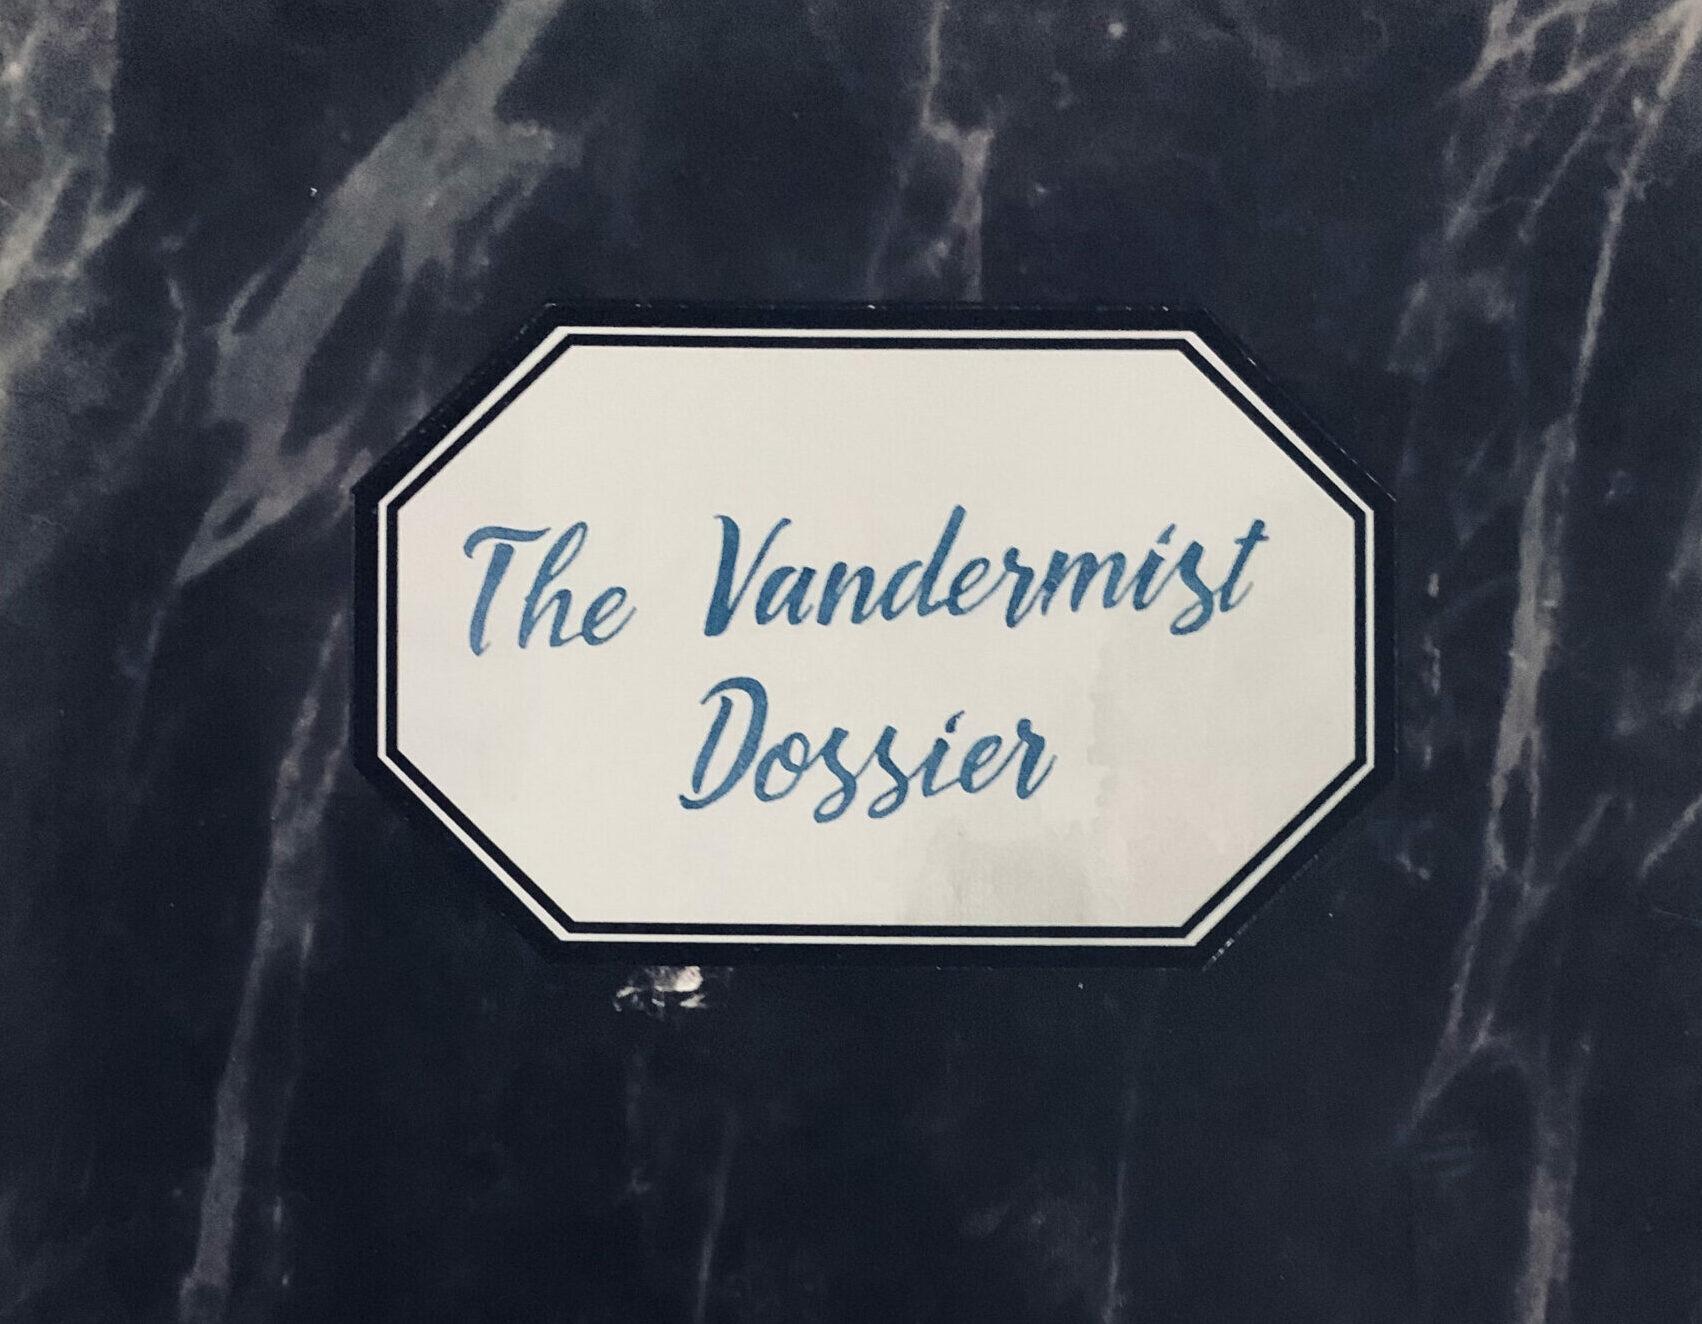 Vandermist Dossier